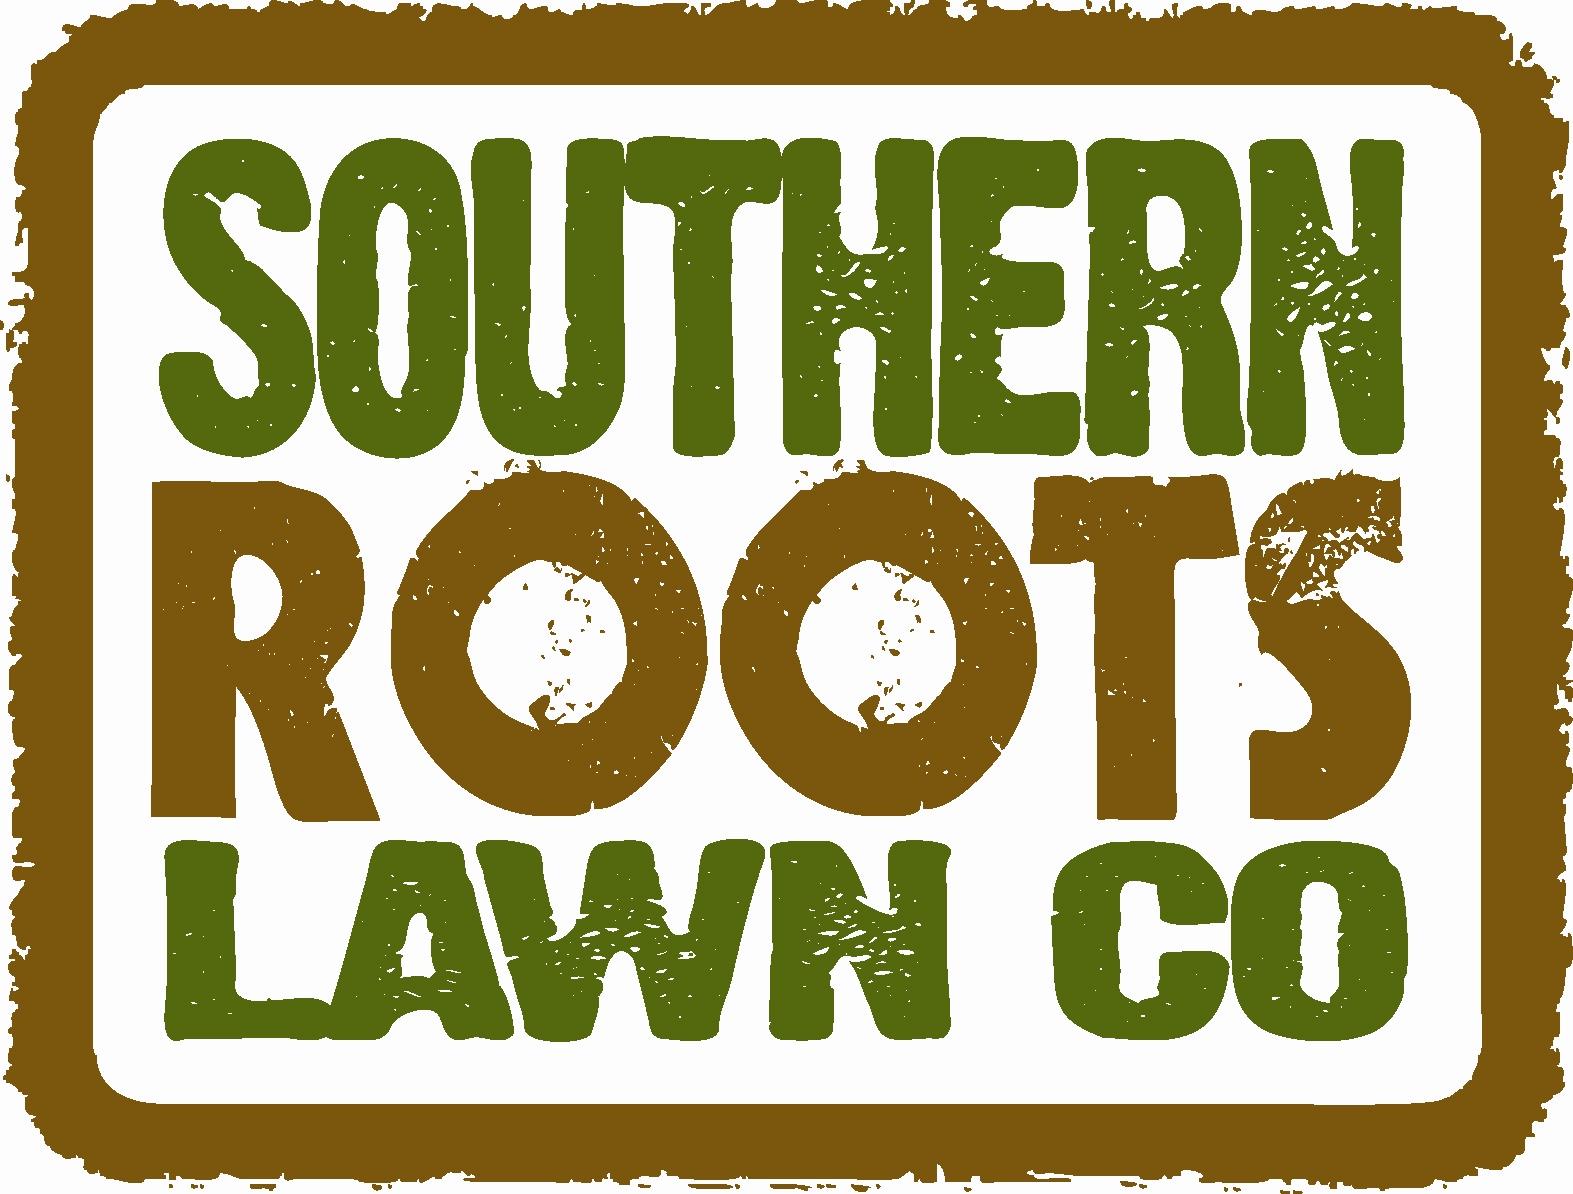 Sroots logo